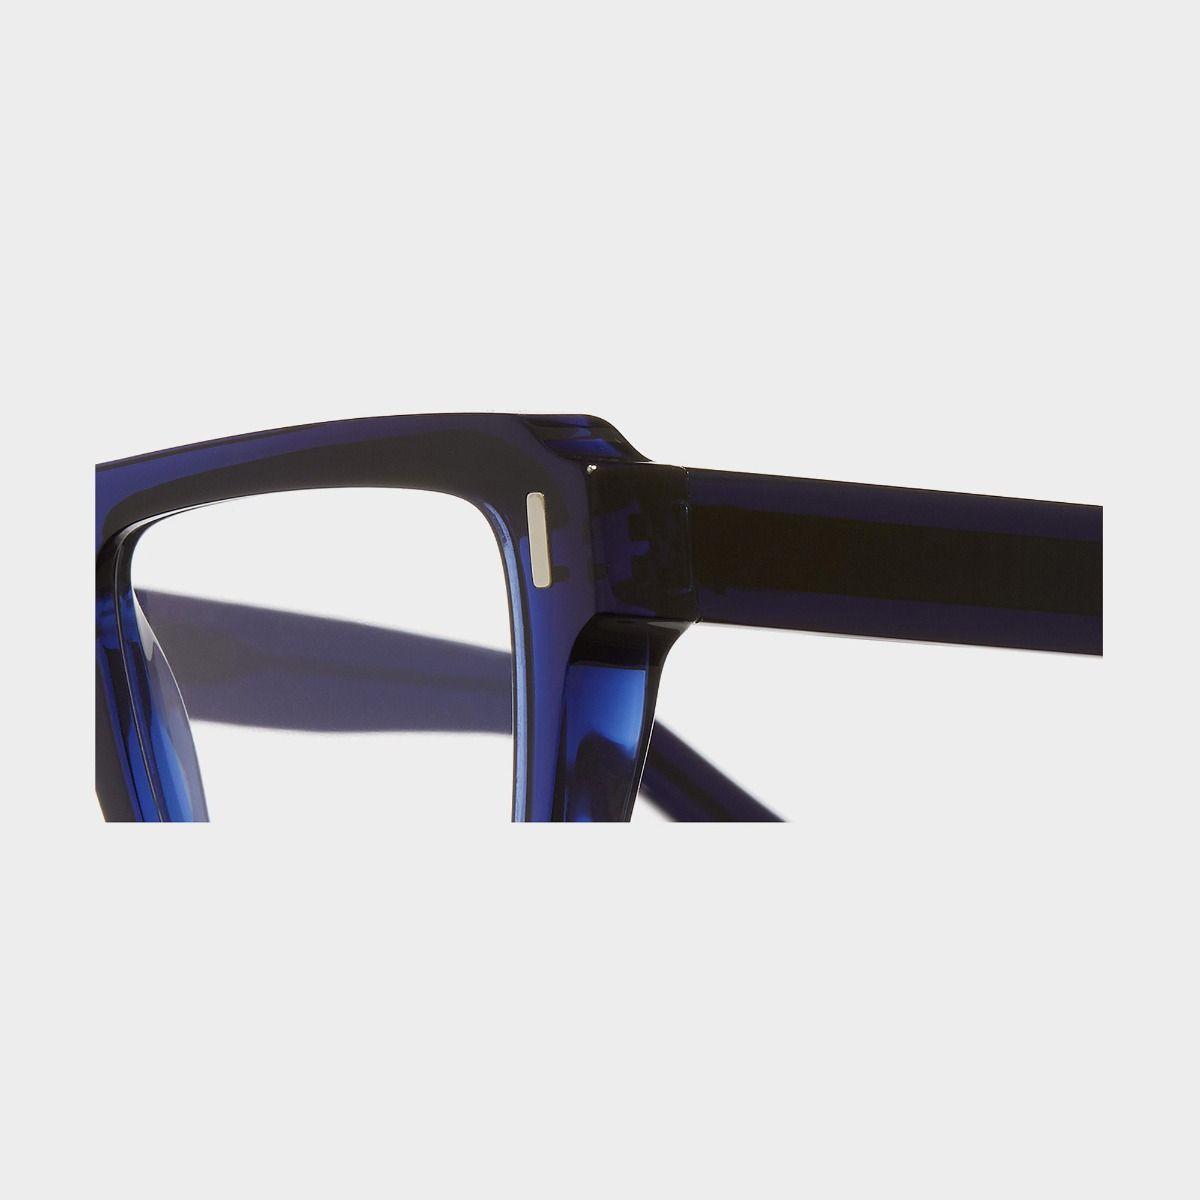 1318 Optical D-Frame Glasses-Classic Navy Blue